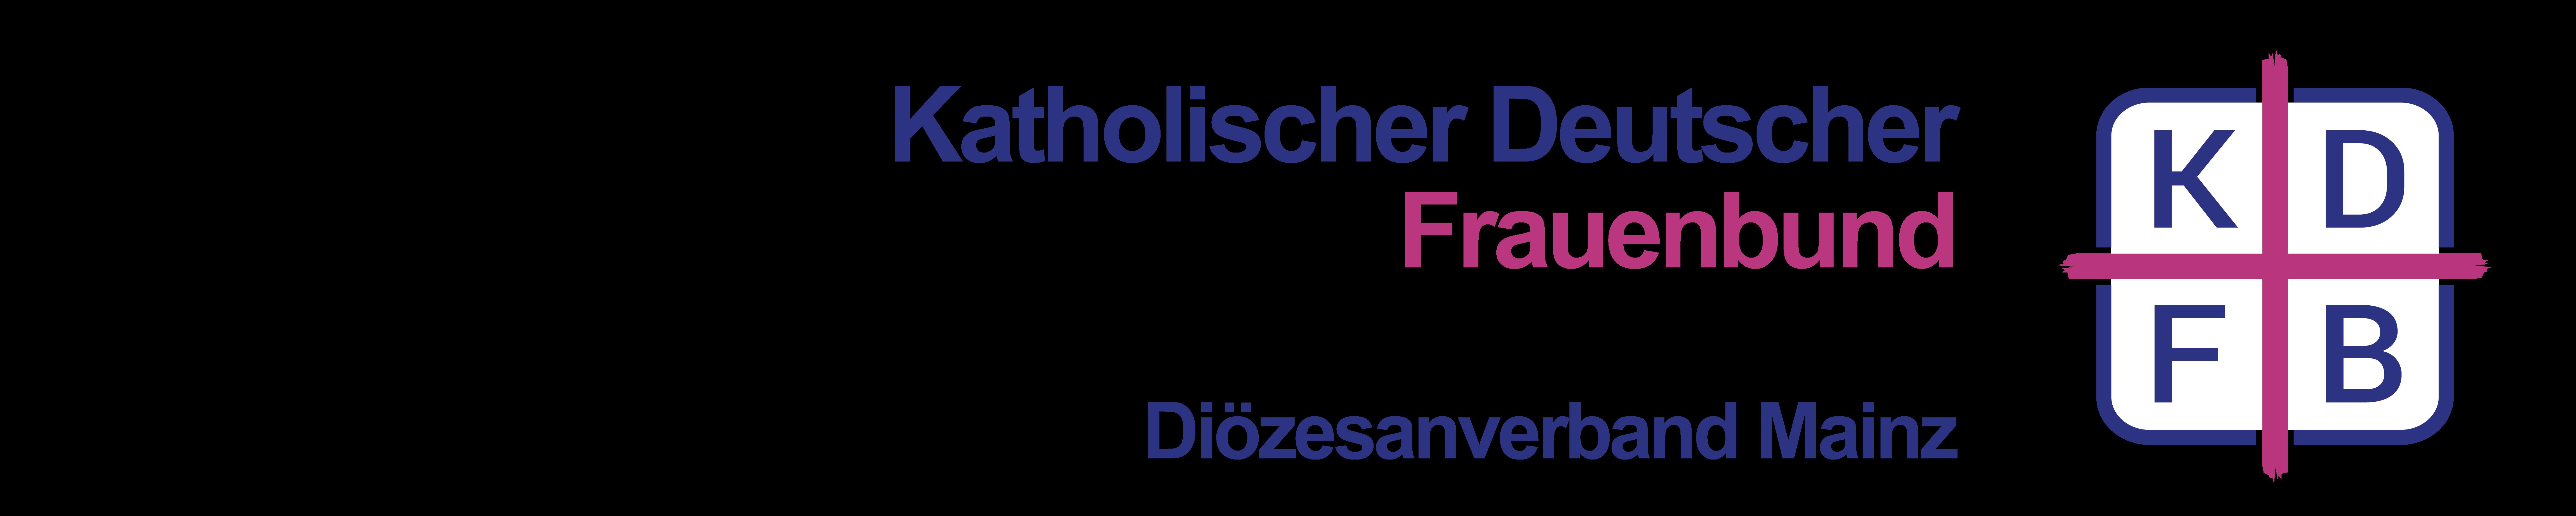 KDFB DV Mainz